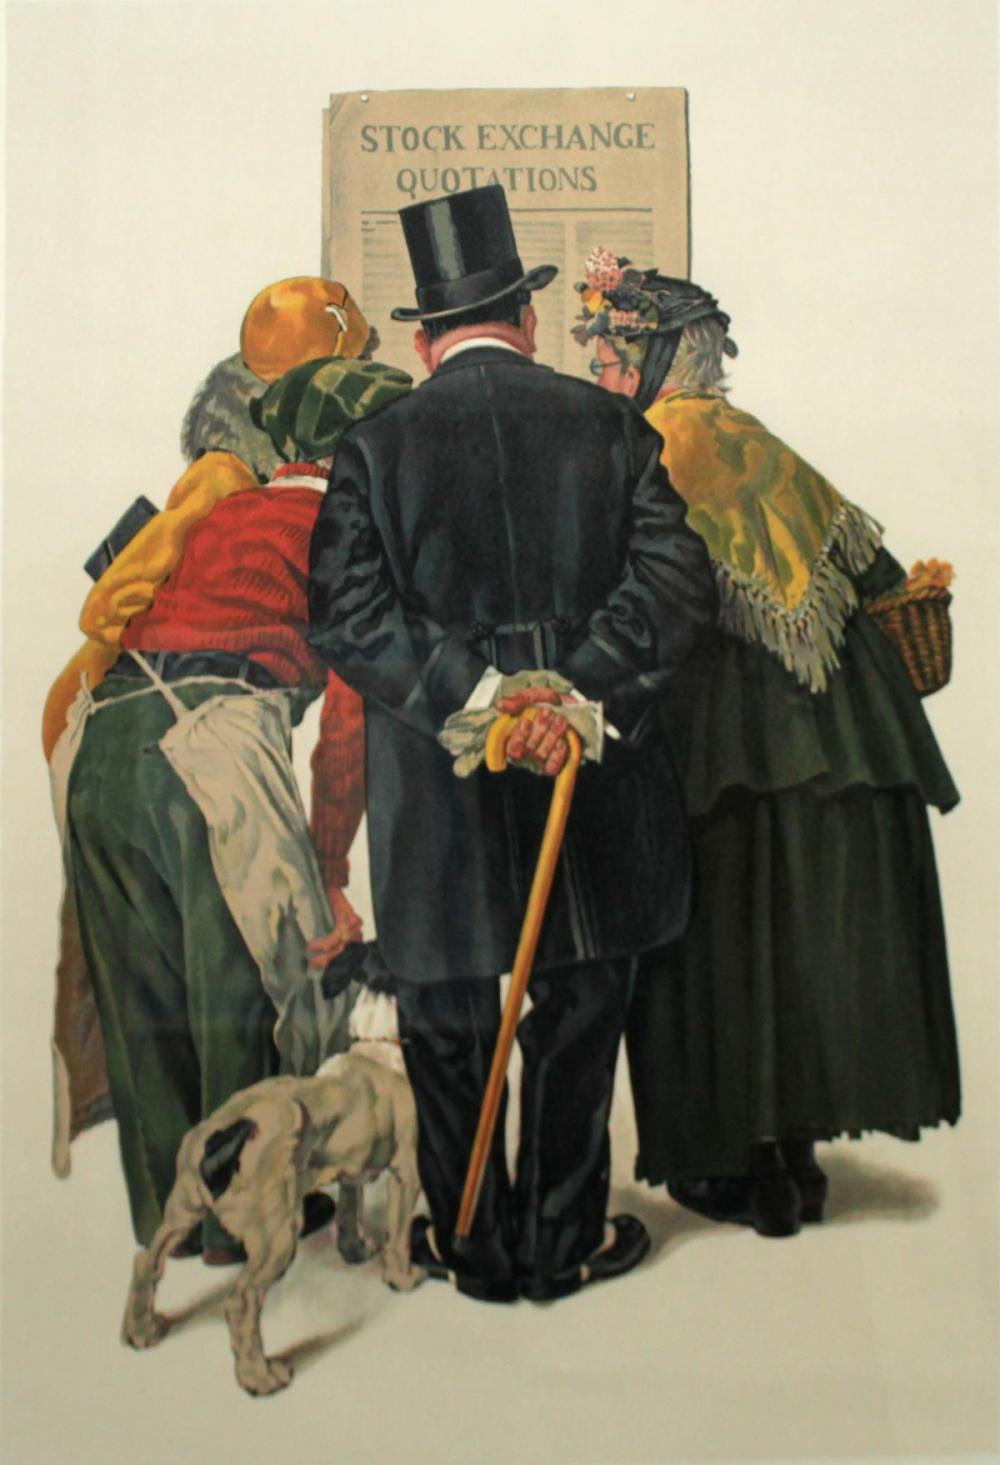 Норман Роквелл - «Люди читают биржевые сводки»